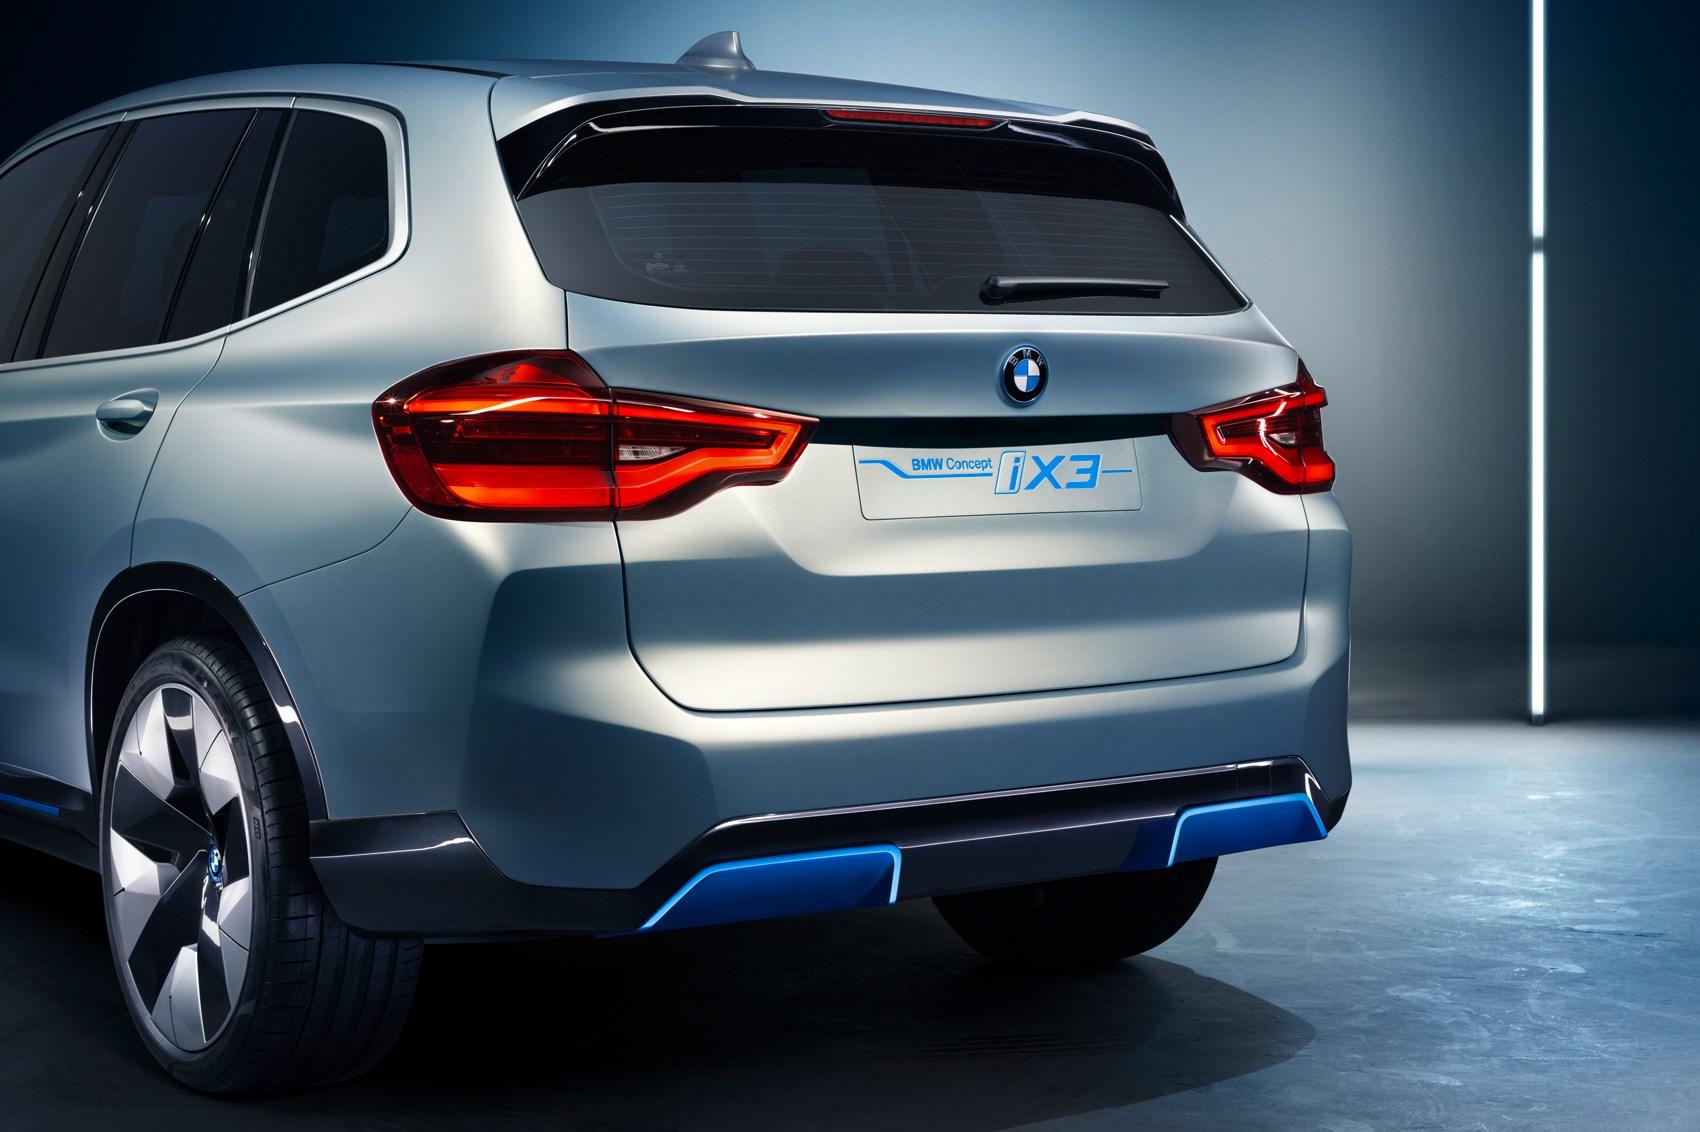 New BMW IX3 Electric SUV: Munich Teases New Wheel Design